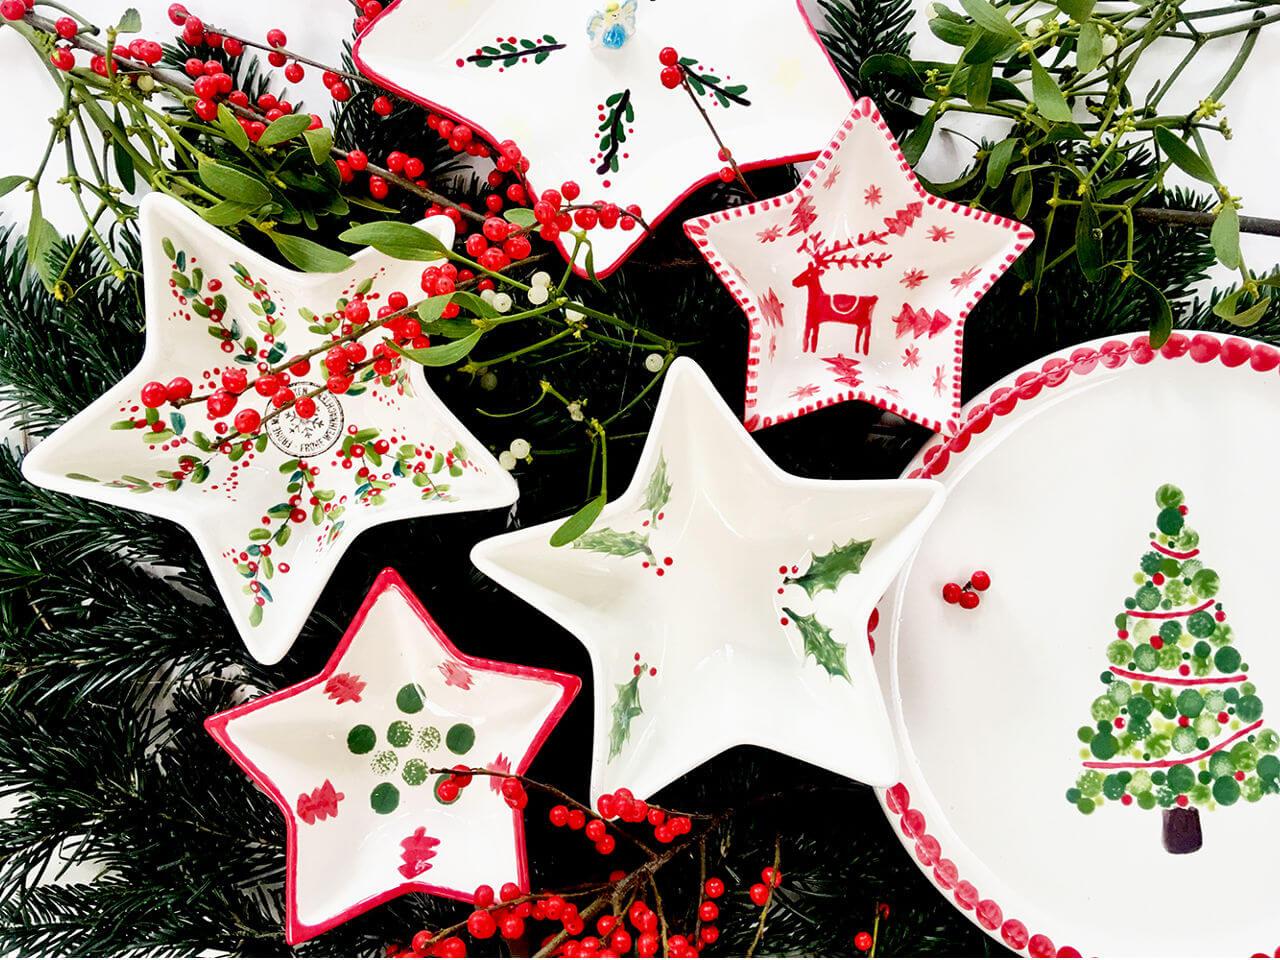 Keramik bemalen Neuss Potteria - Weihnachtsfeier